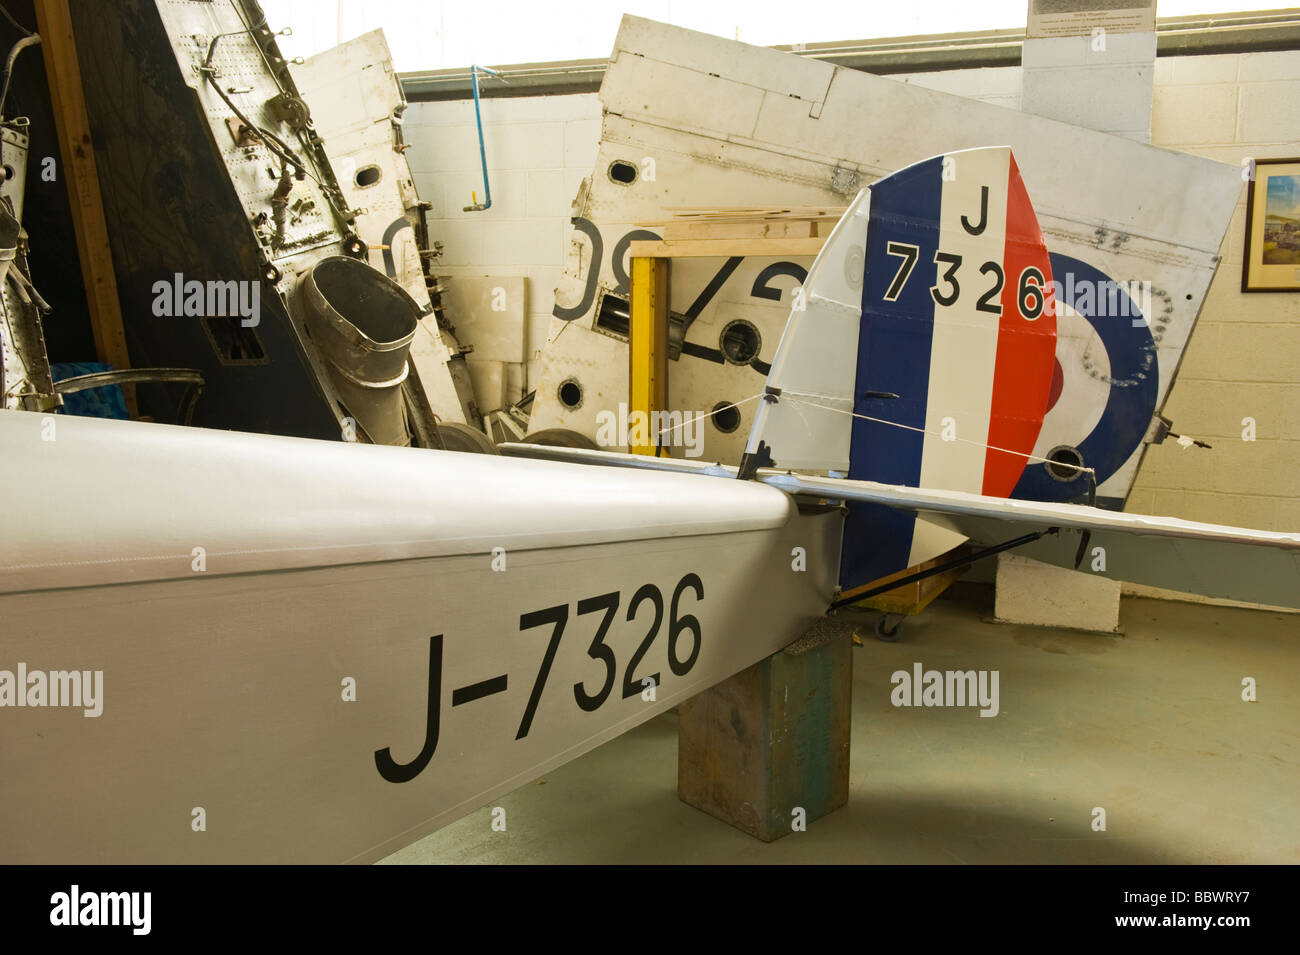 De Havilland Aviation Heritage Centre Mosquito Museum DH53 Humming Bird Tail détail 1923/4 1 de 15 construit Photo Stock